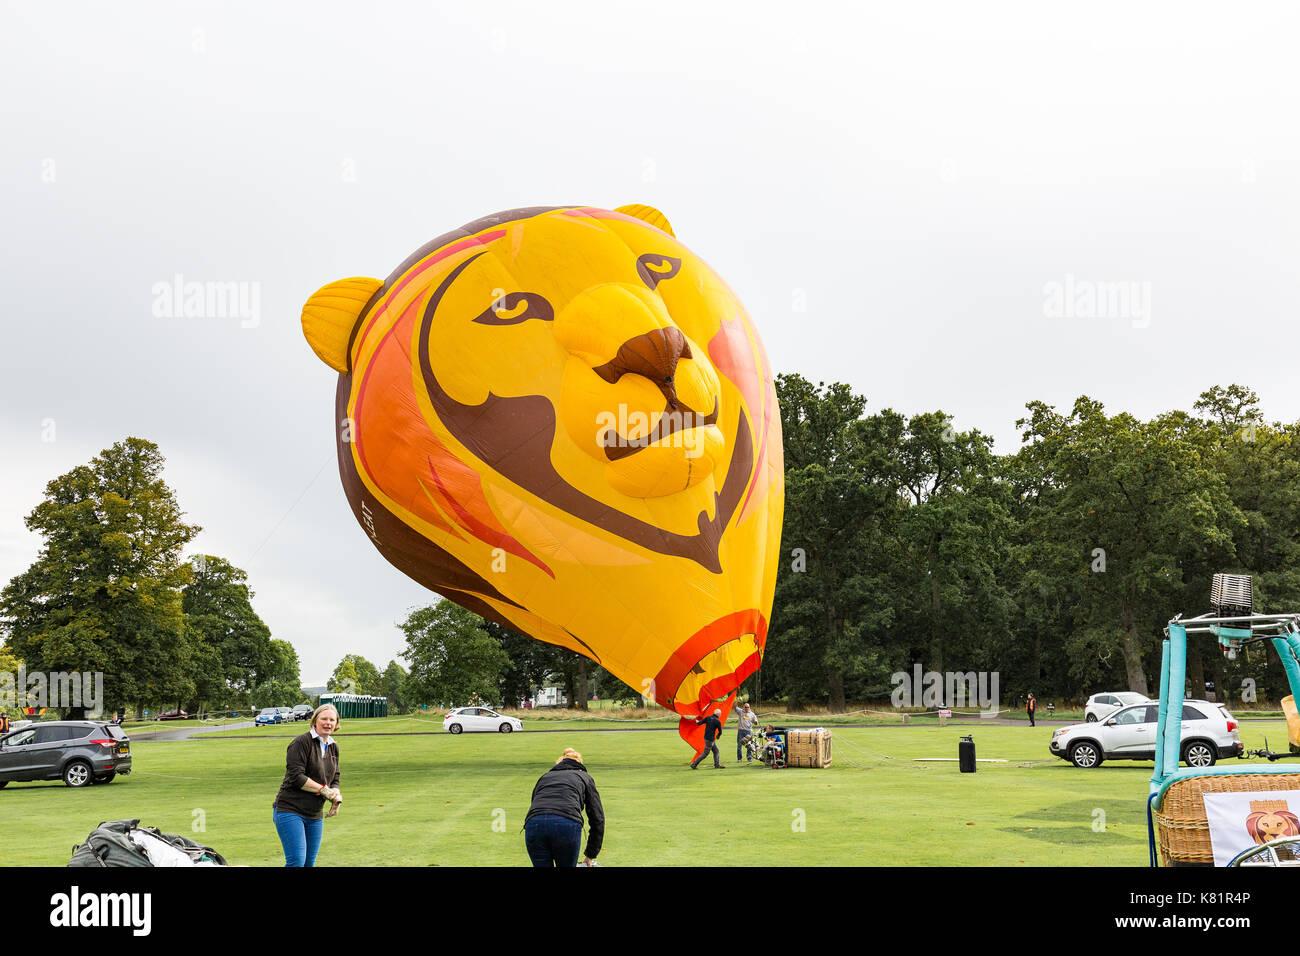 Longleat Sky Safari held at Loingleat Safari Park in Warminster Wilts. - Stock Image